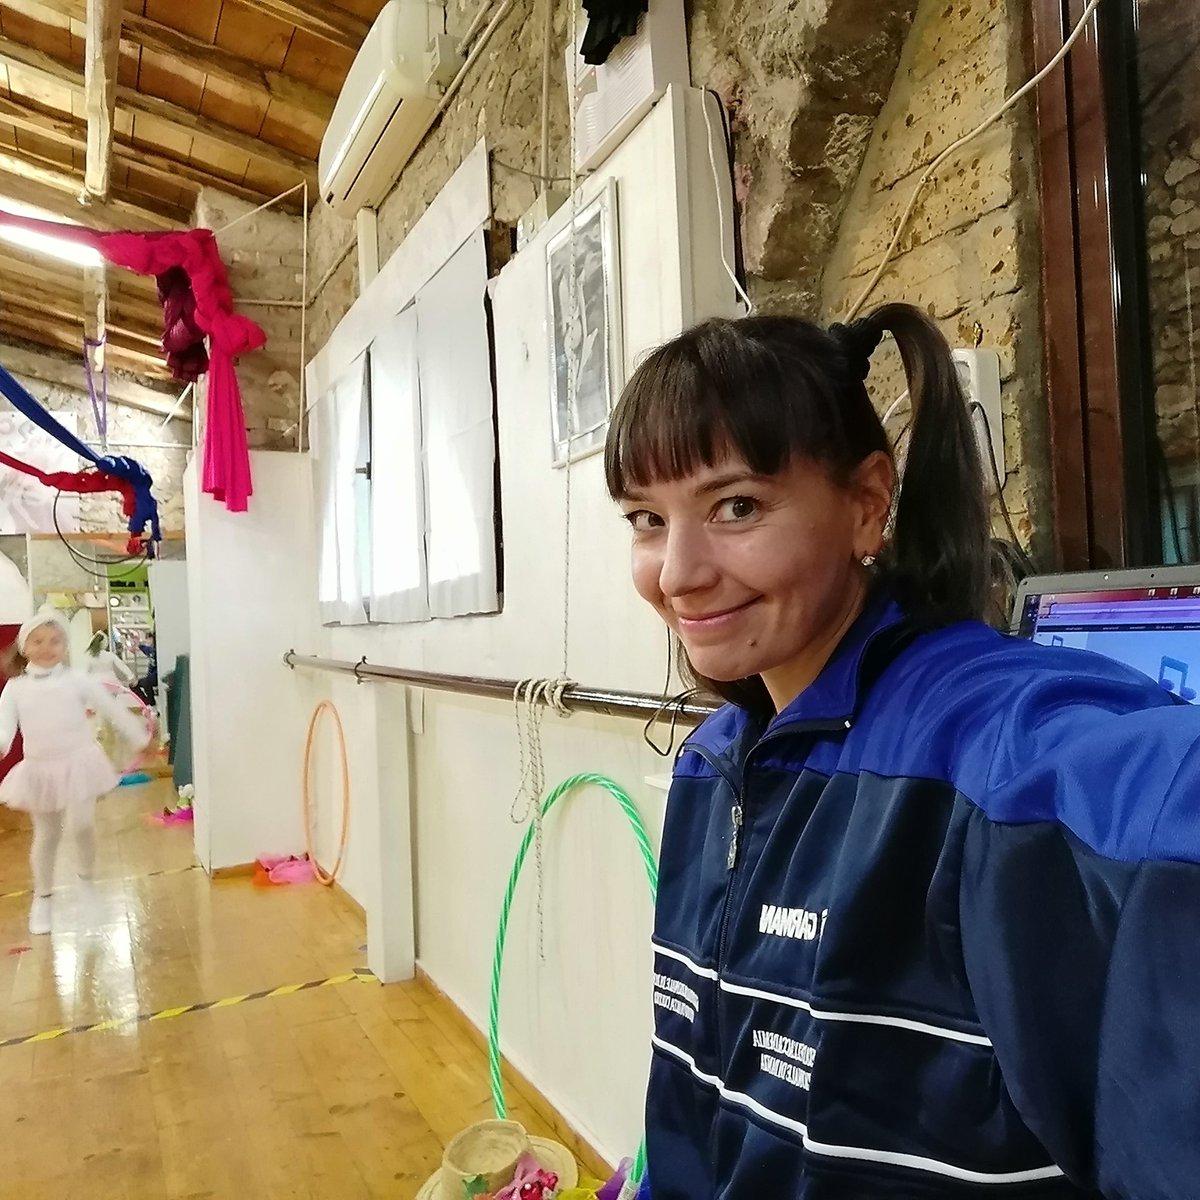 Today #piccole #pesti #arrivano #dancer #choreographer #teacher #exercises #pictures #picoftheday #dancerlife #workoutroutine #instarai #instalike #instadancer #instalove #photooftheday https://t.co/5M9oY19dt3